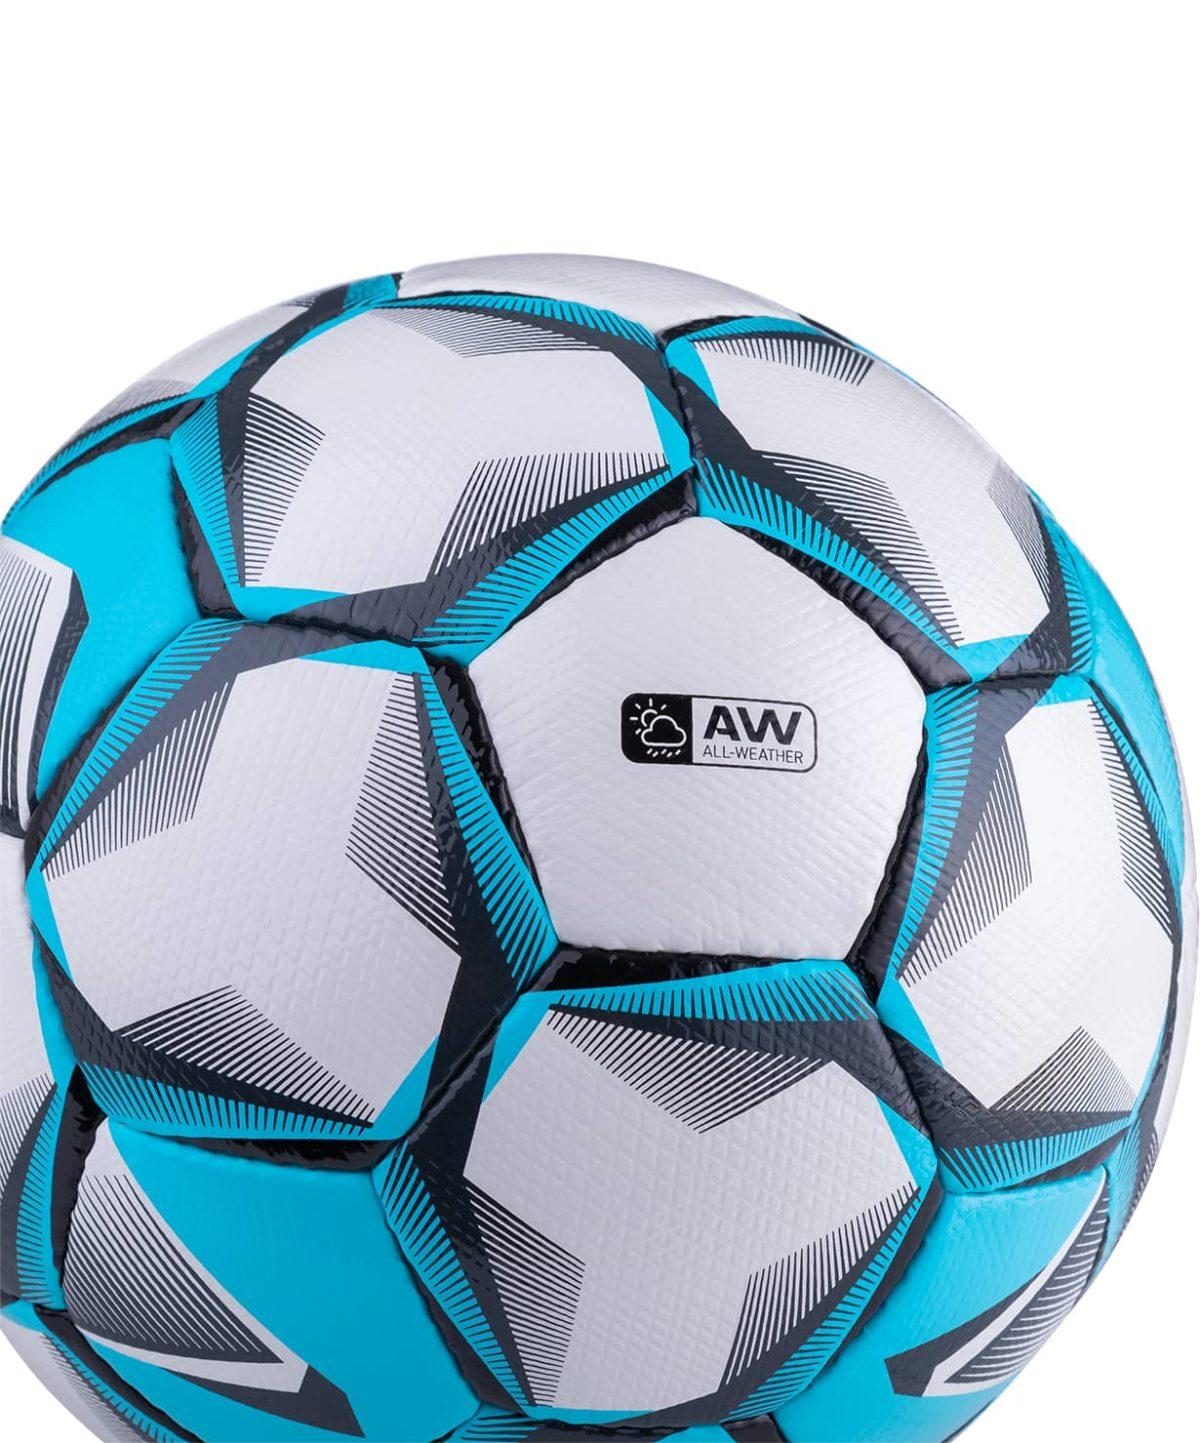 JOGEL Nueno Мяч футбольный  Nueno №5 (BC-20) - 5